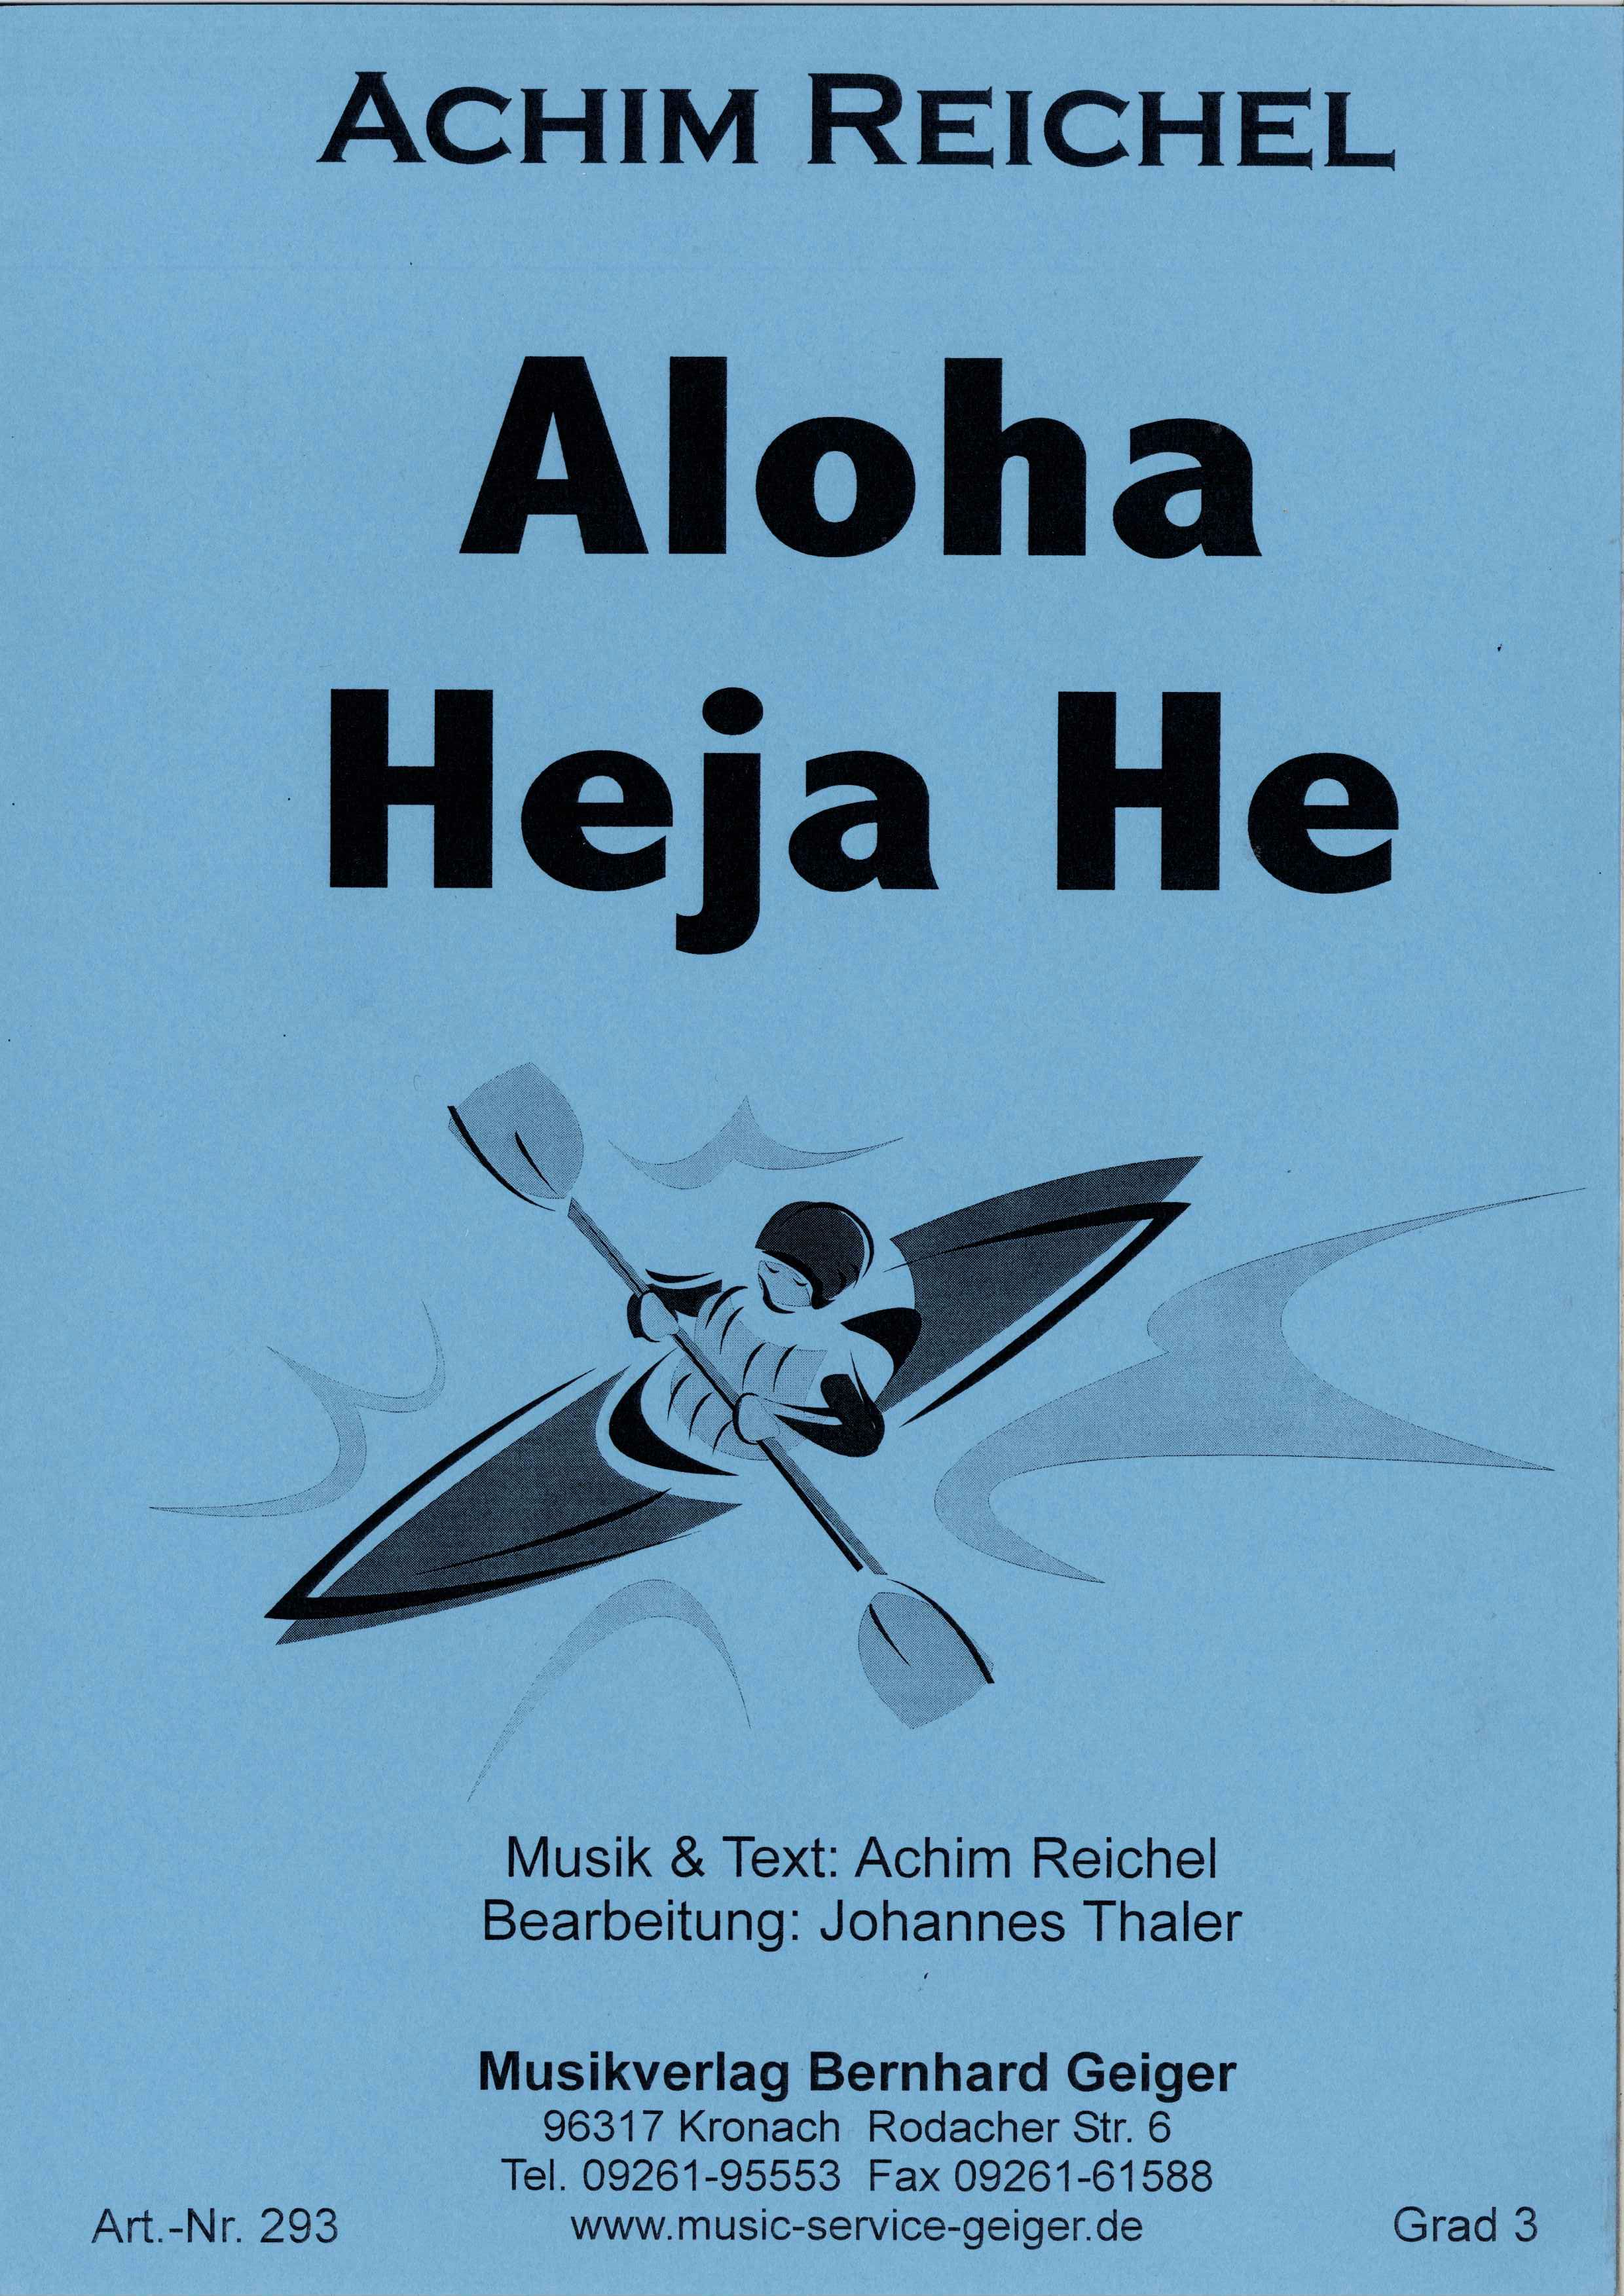 He noten text heja aloha und ALOHA HEJA